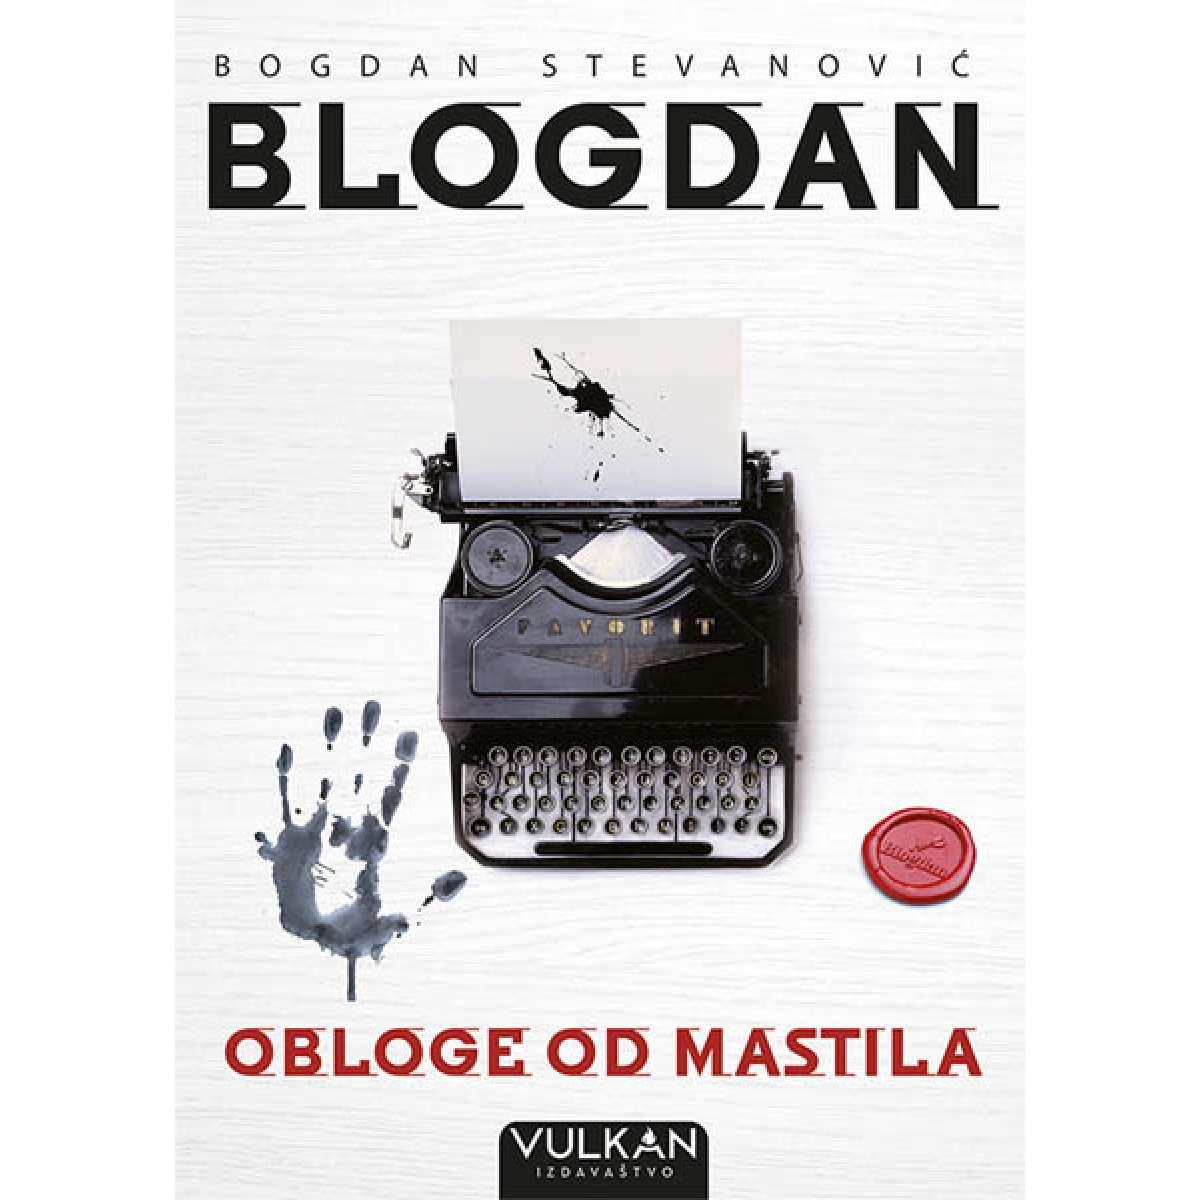 OBLOGE OD MASTILA